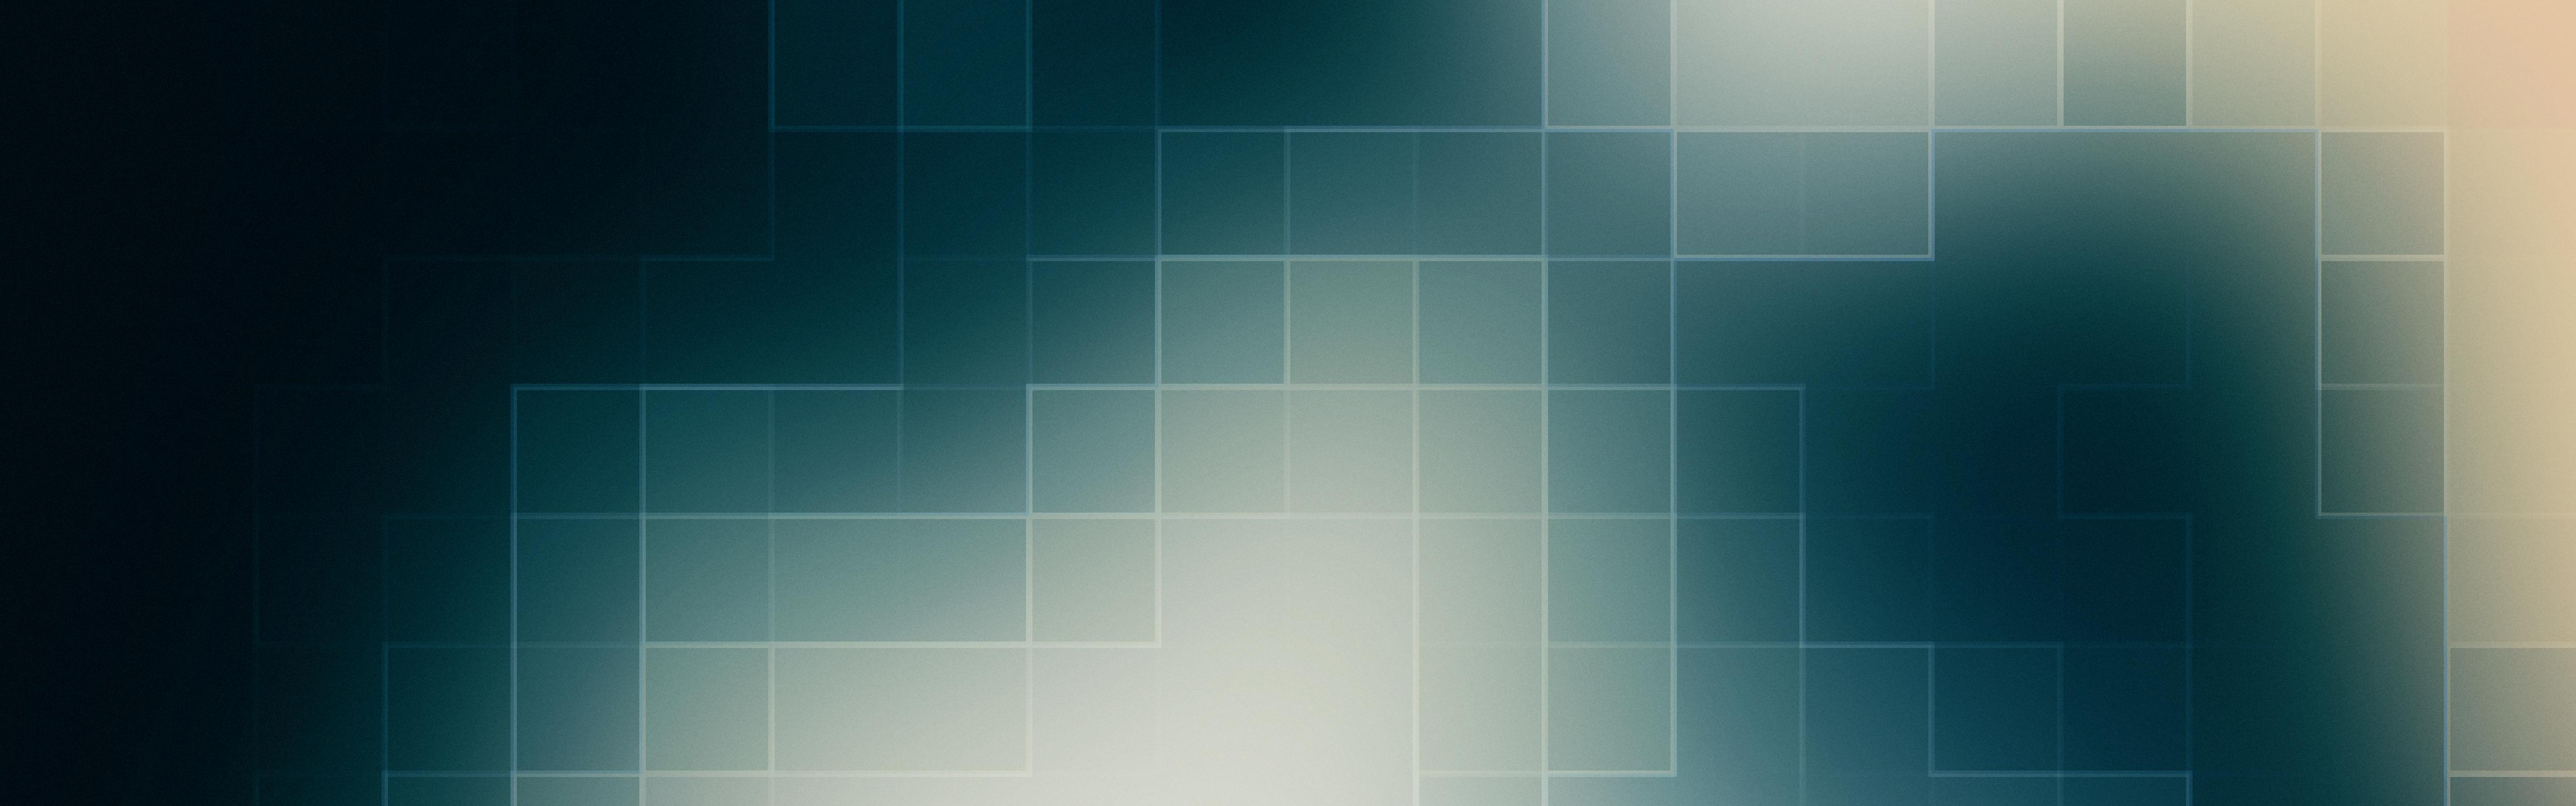 star wars desktop wallpaper dual monitor